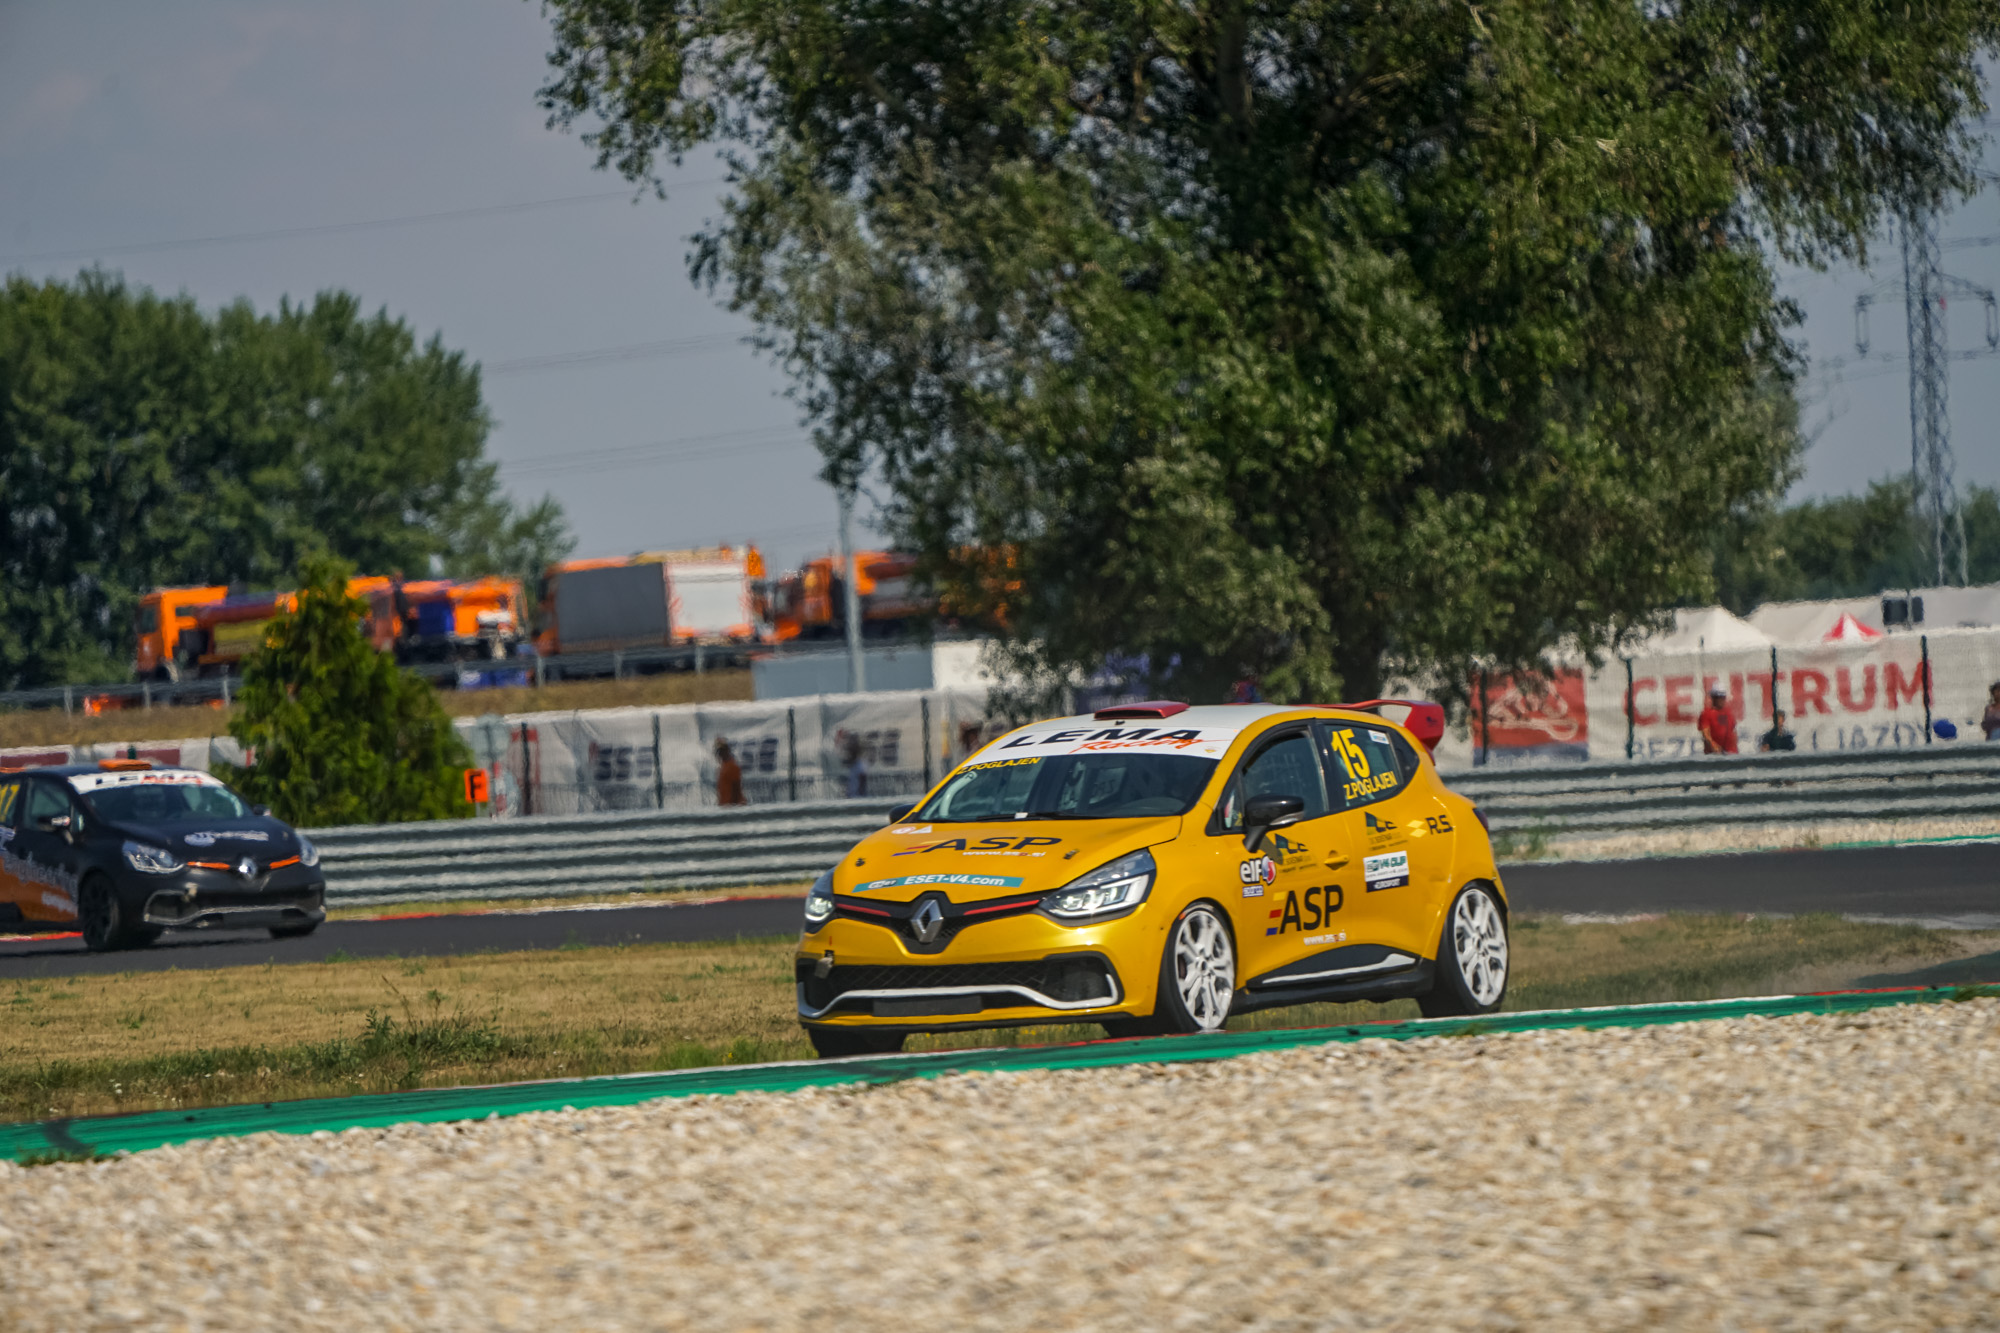 Zoran Poglajen zůstává věrný Renaultu Clio